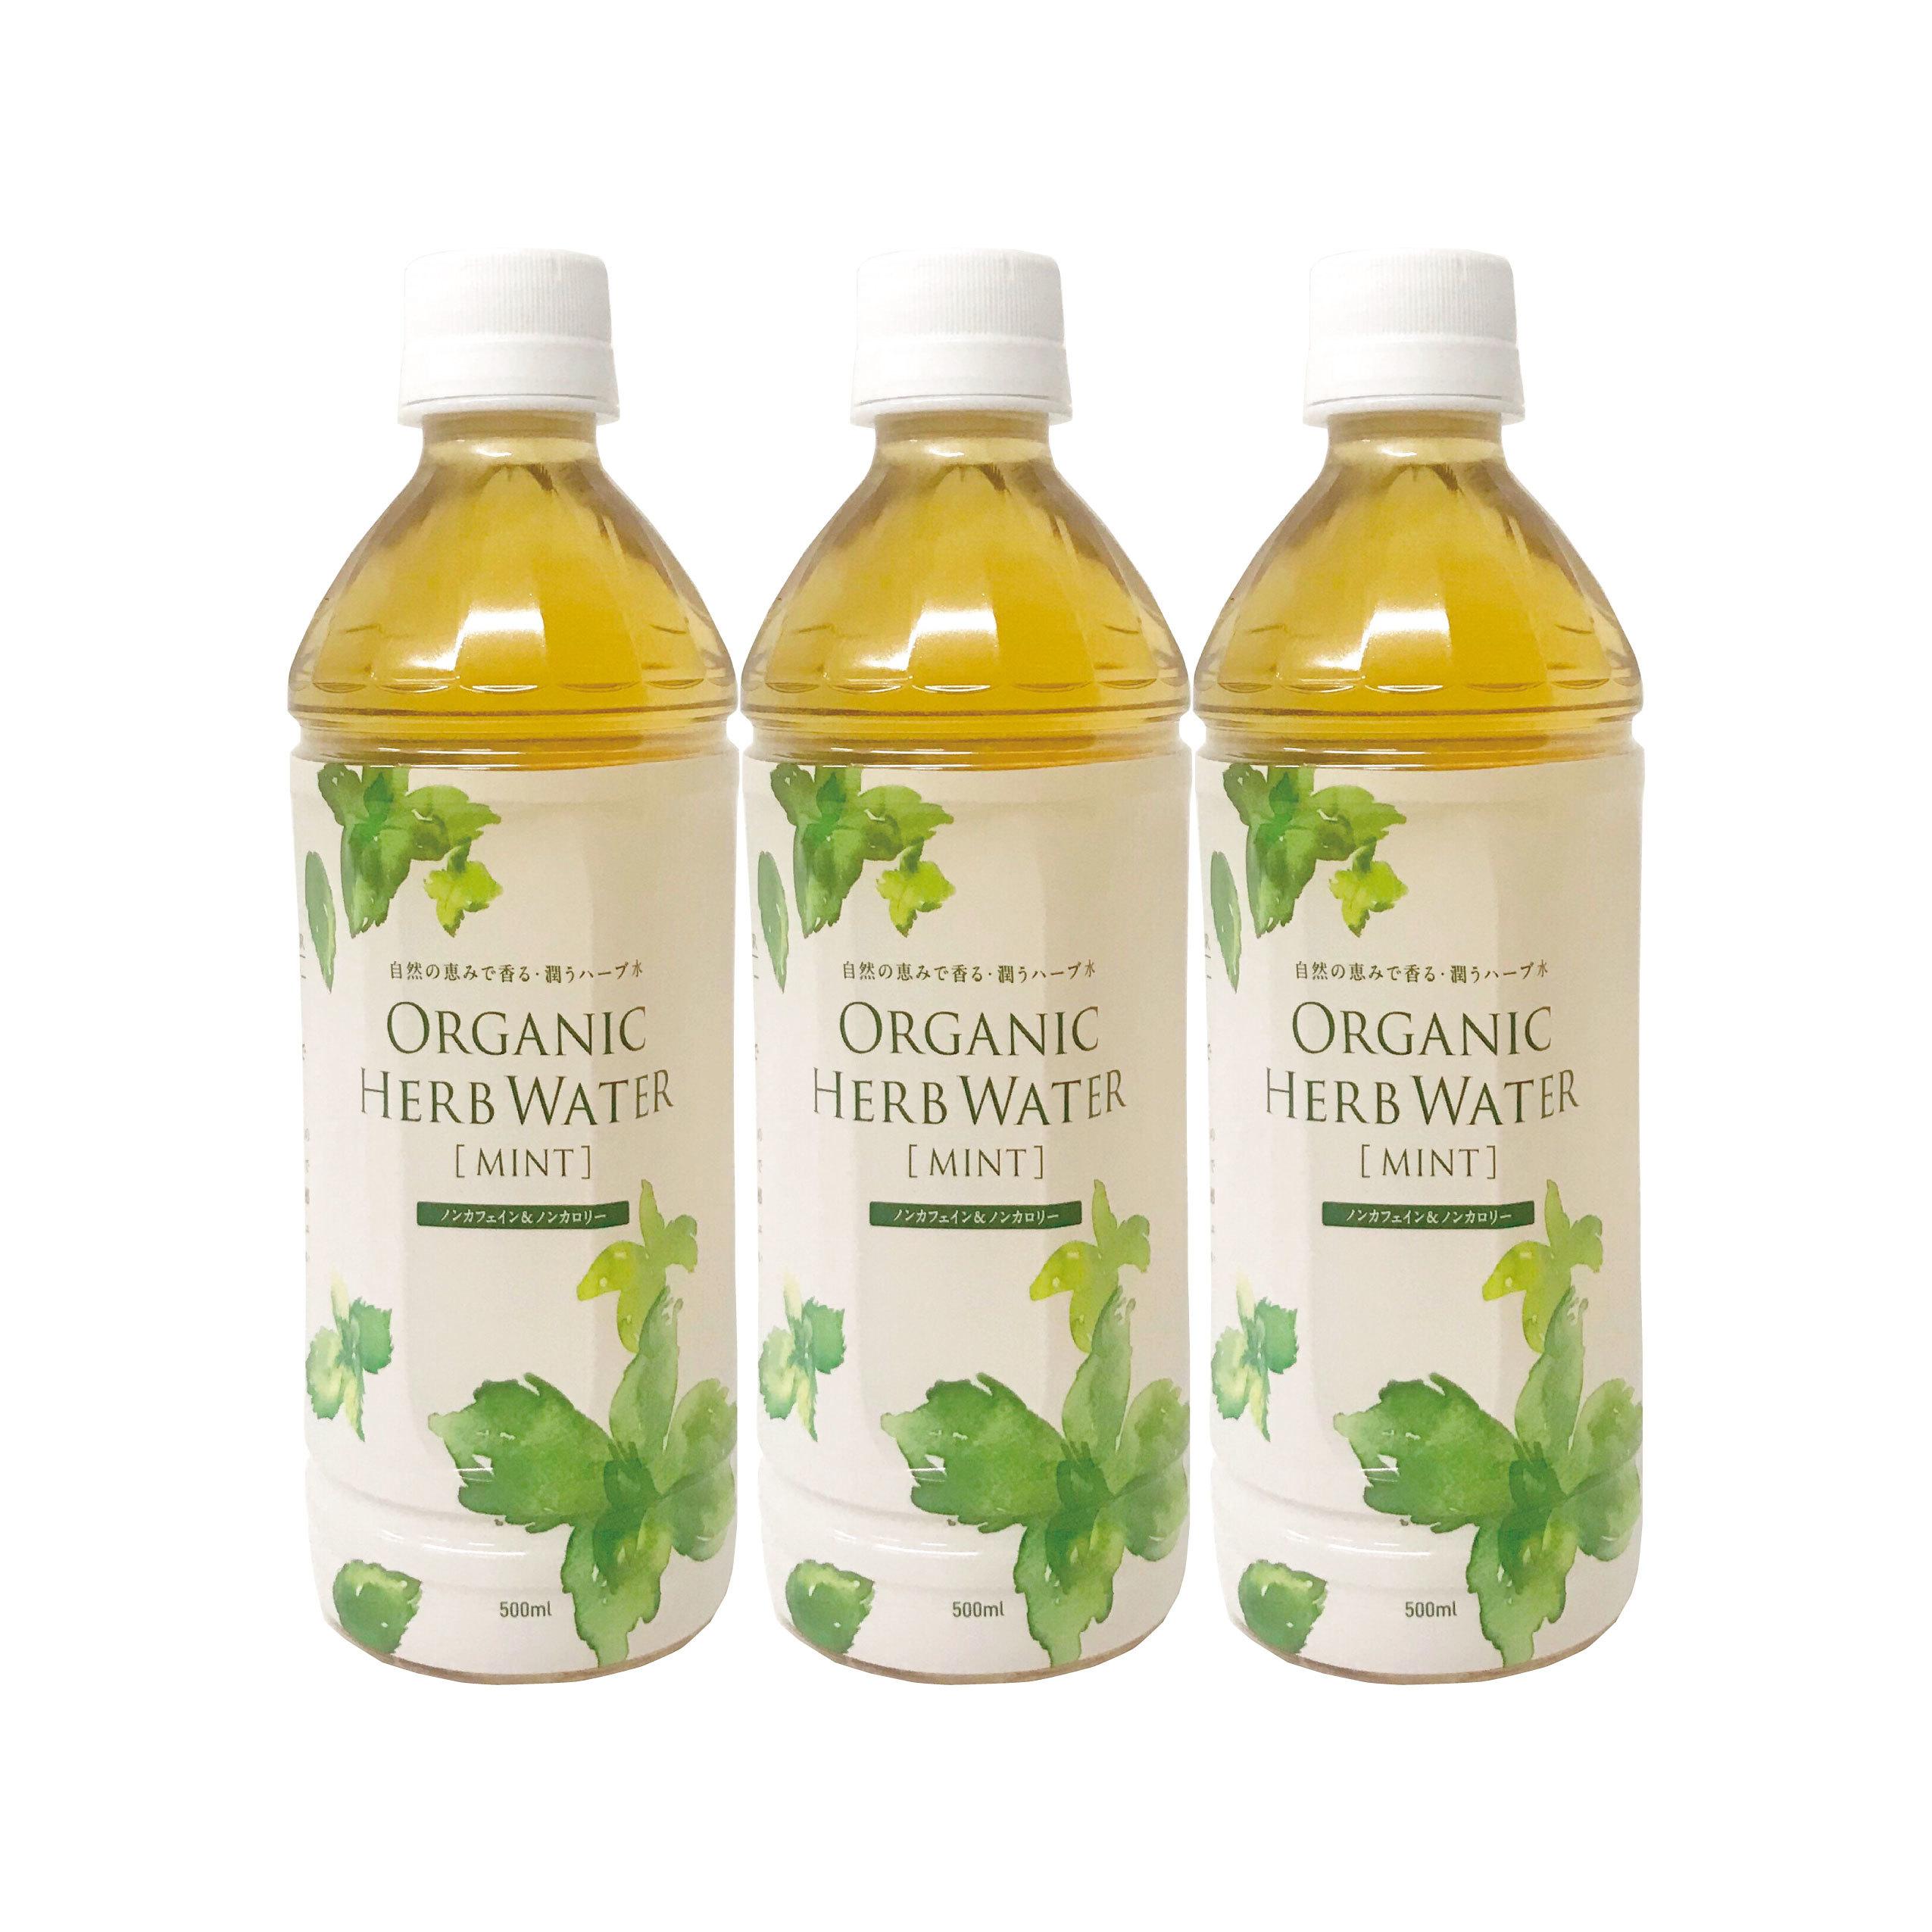 【SET】Organic Herb Water (Mint) ×24